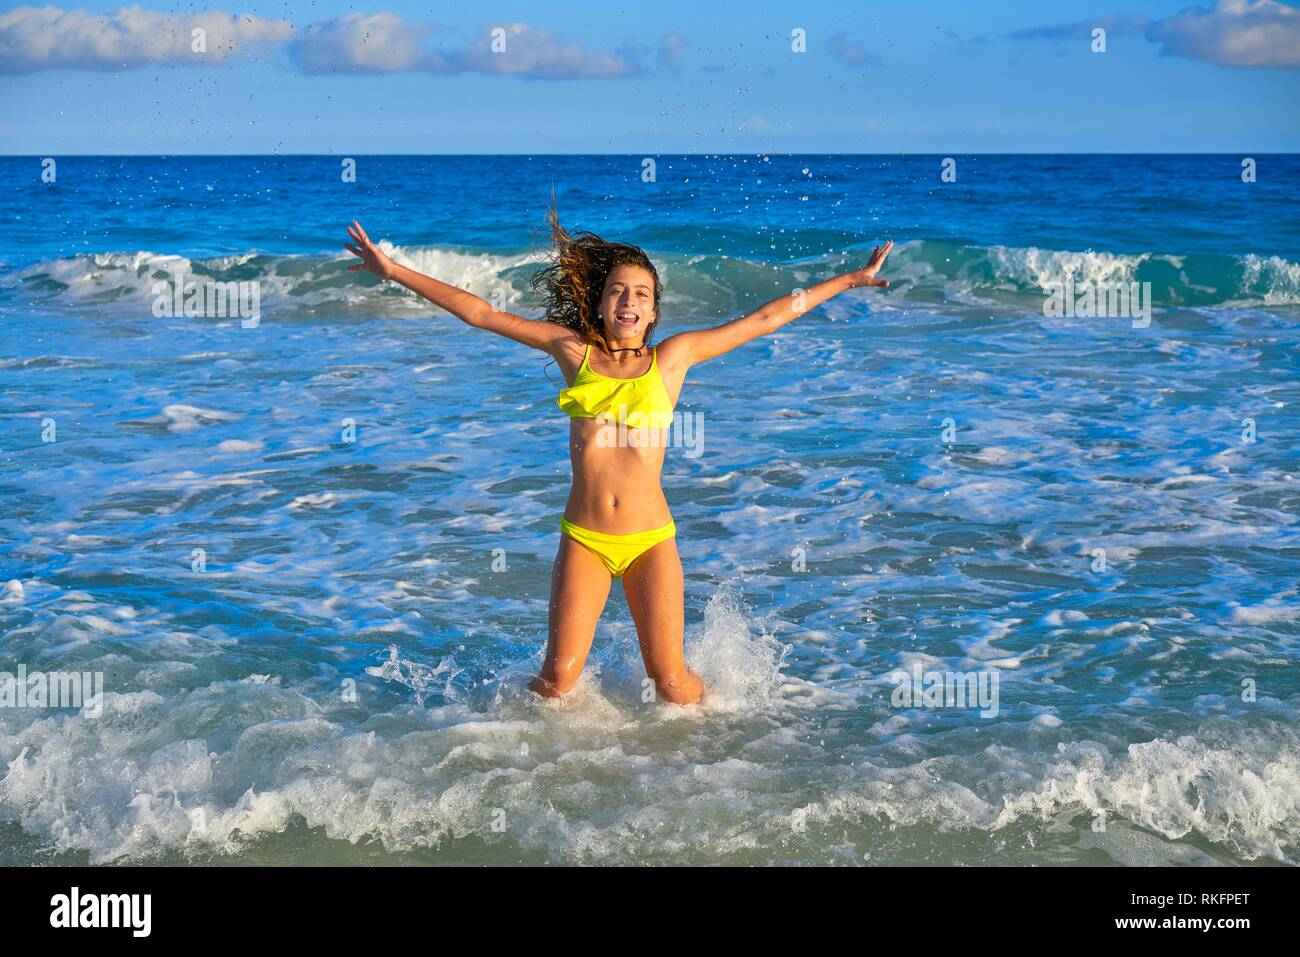 Bikini teen girl jumping happyt in Caribbean sunset beach splashing shore. - Stock Image